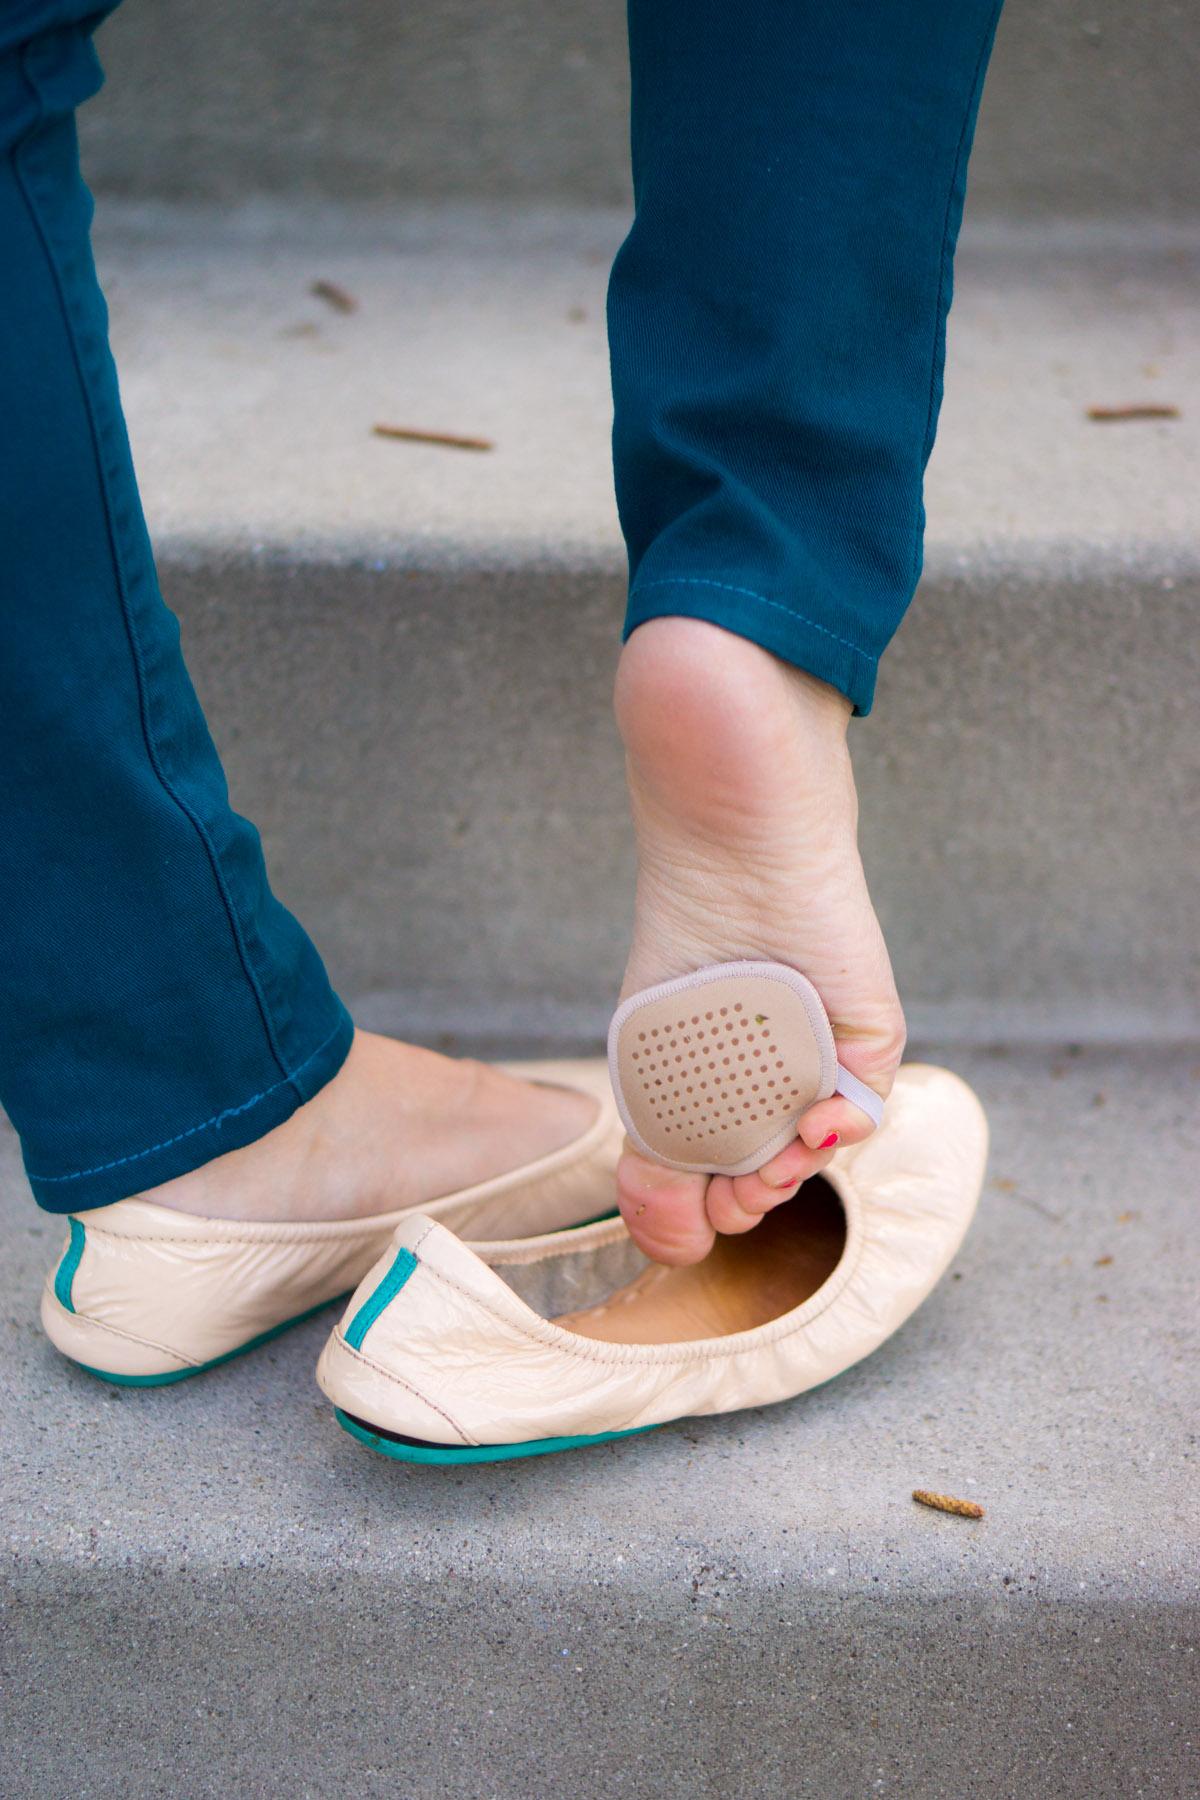 Sheec SockShion + Tieks Ballet Flats